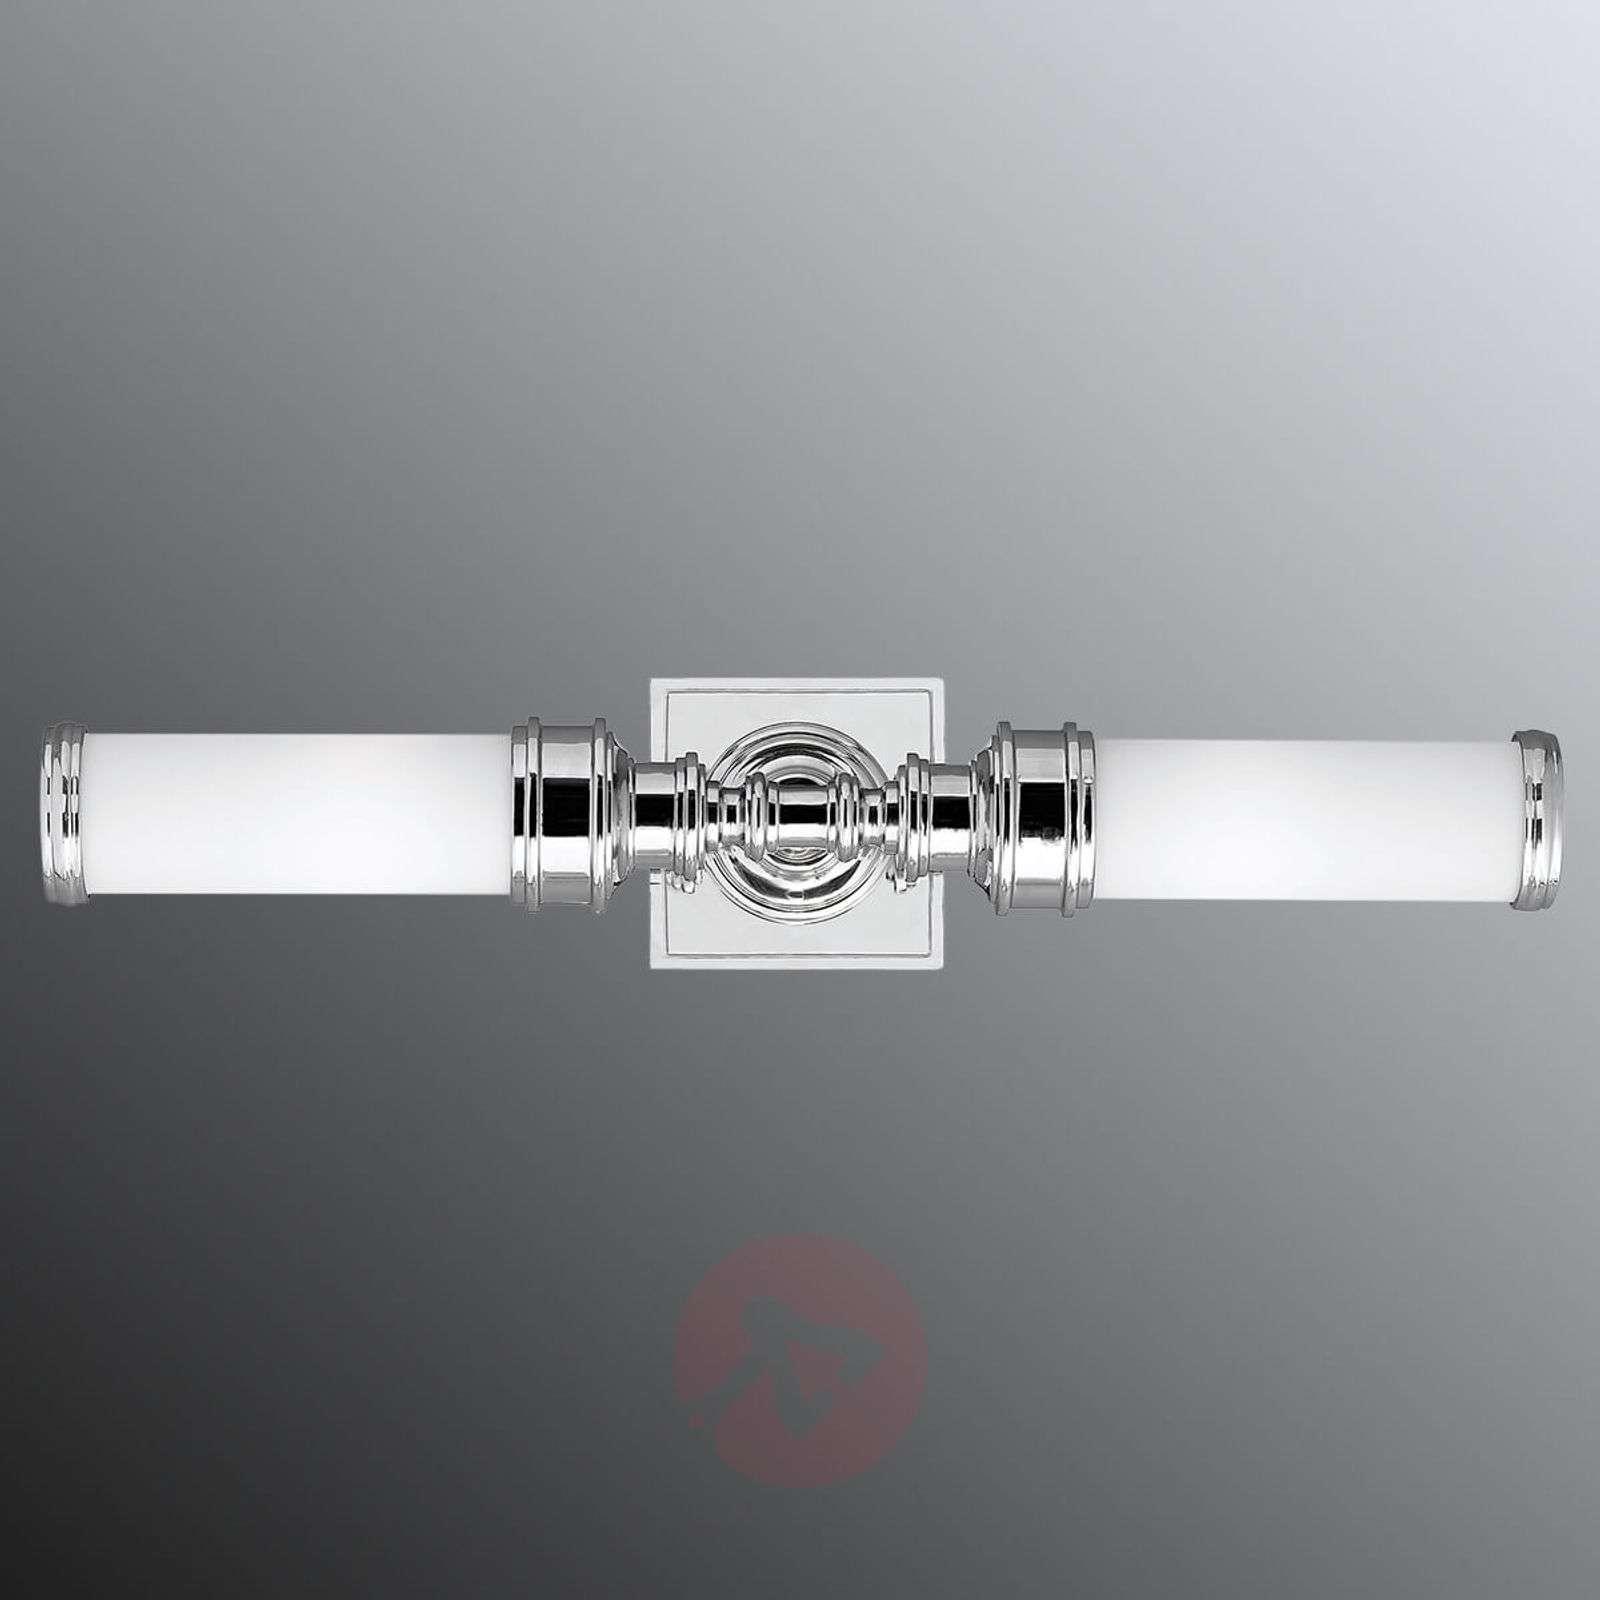 Payne Ornate wall light for moisture-prone rooms-3048652-01